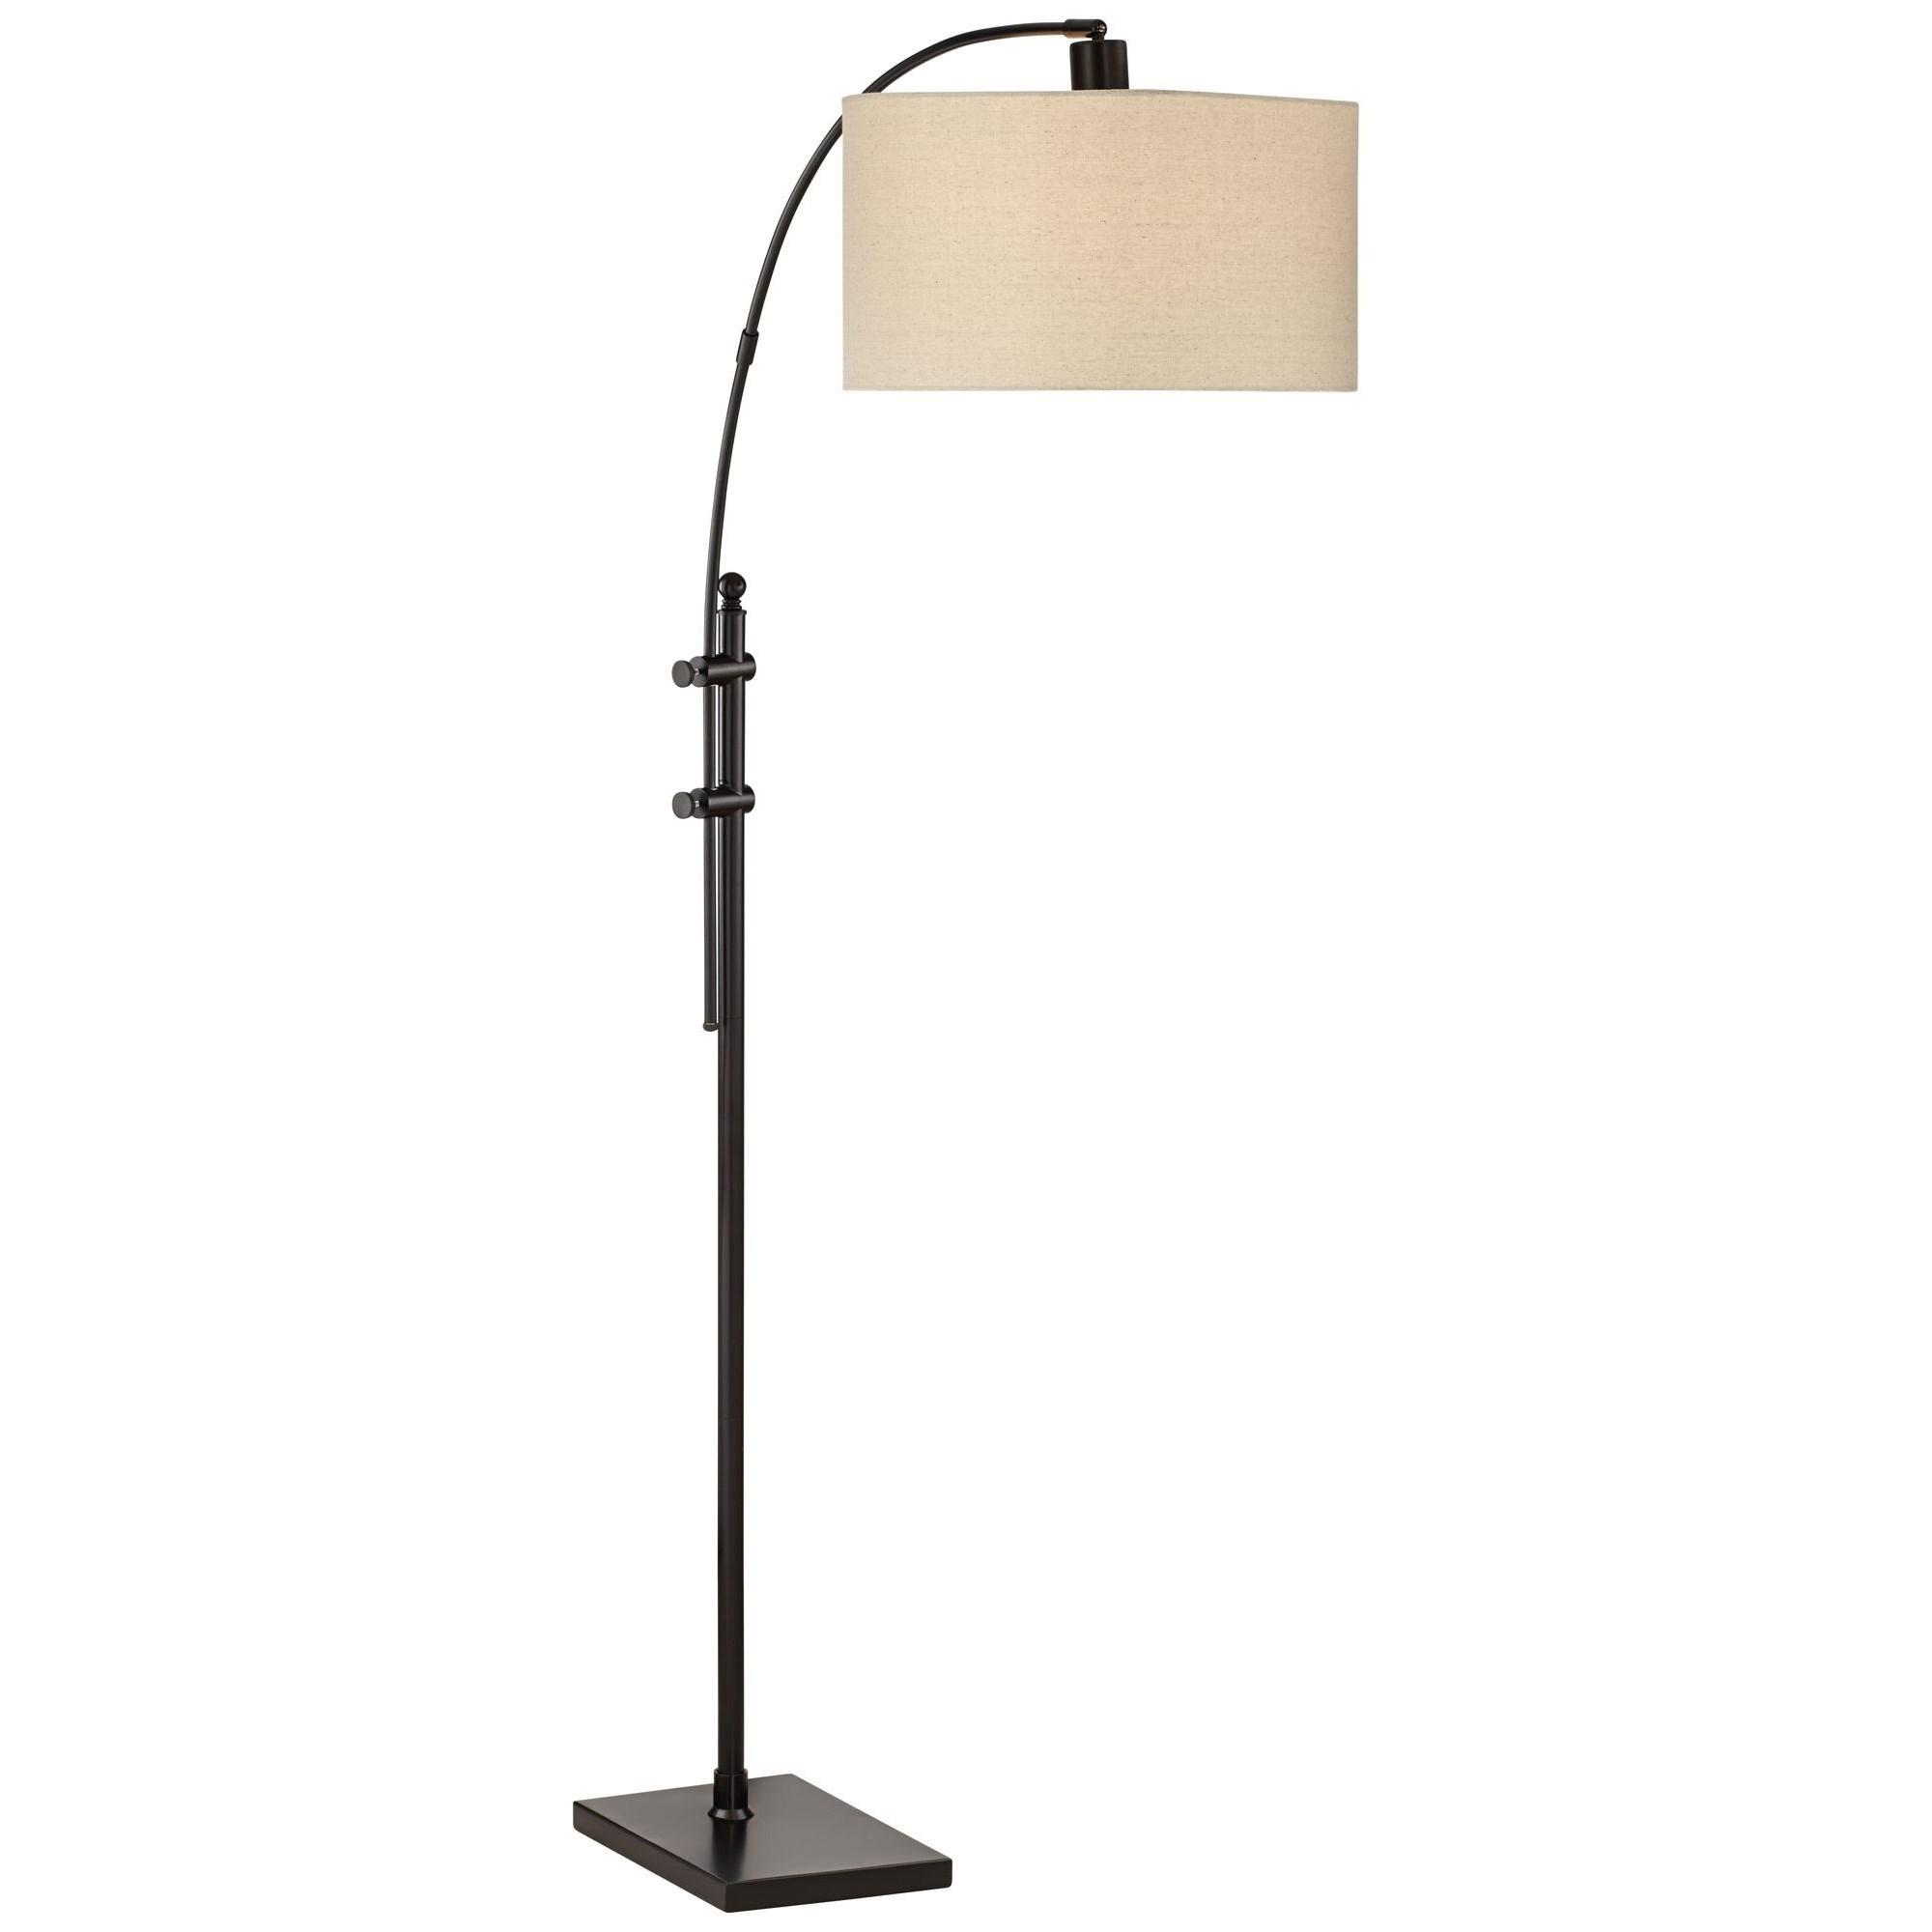 Spotlight Collection Floor Lamp